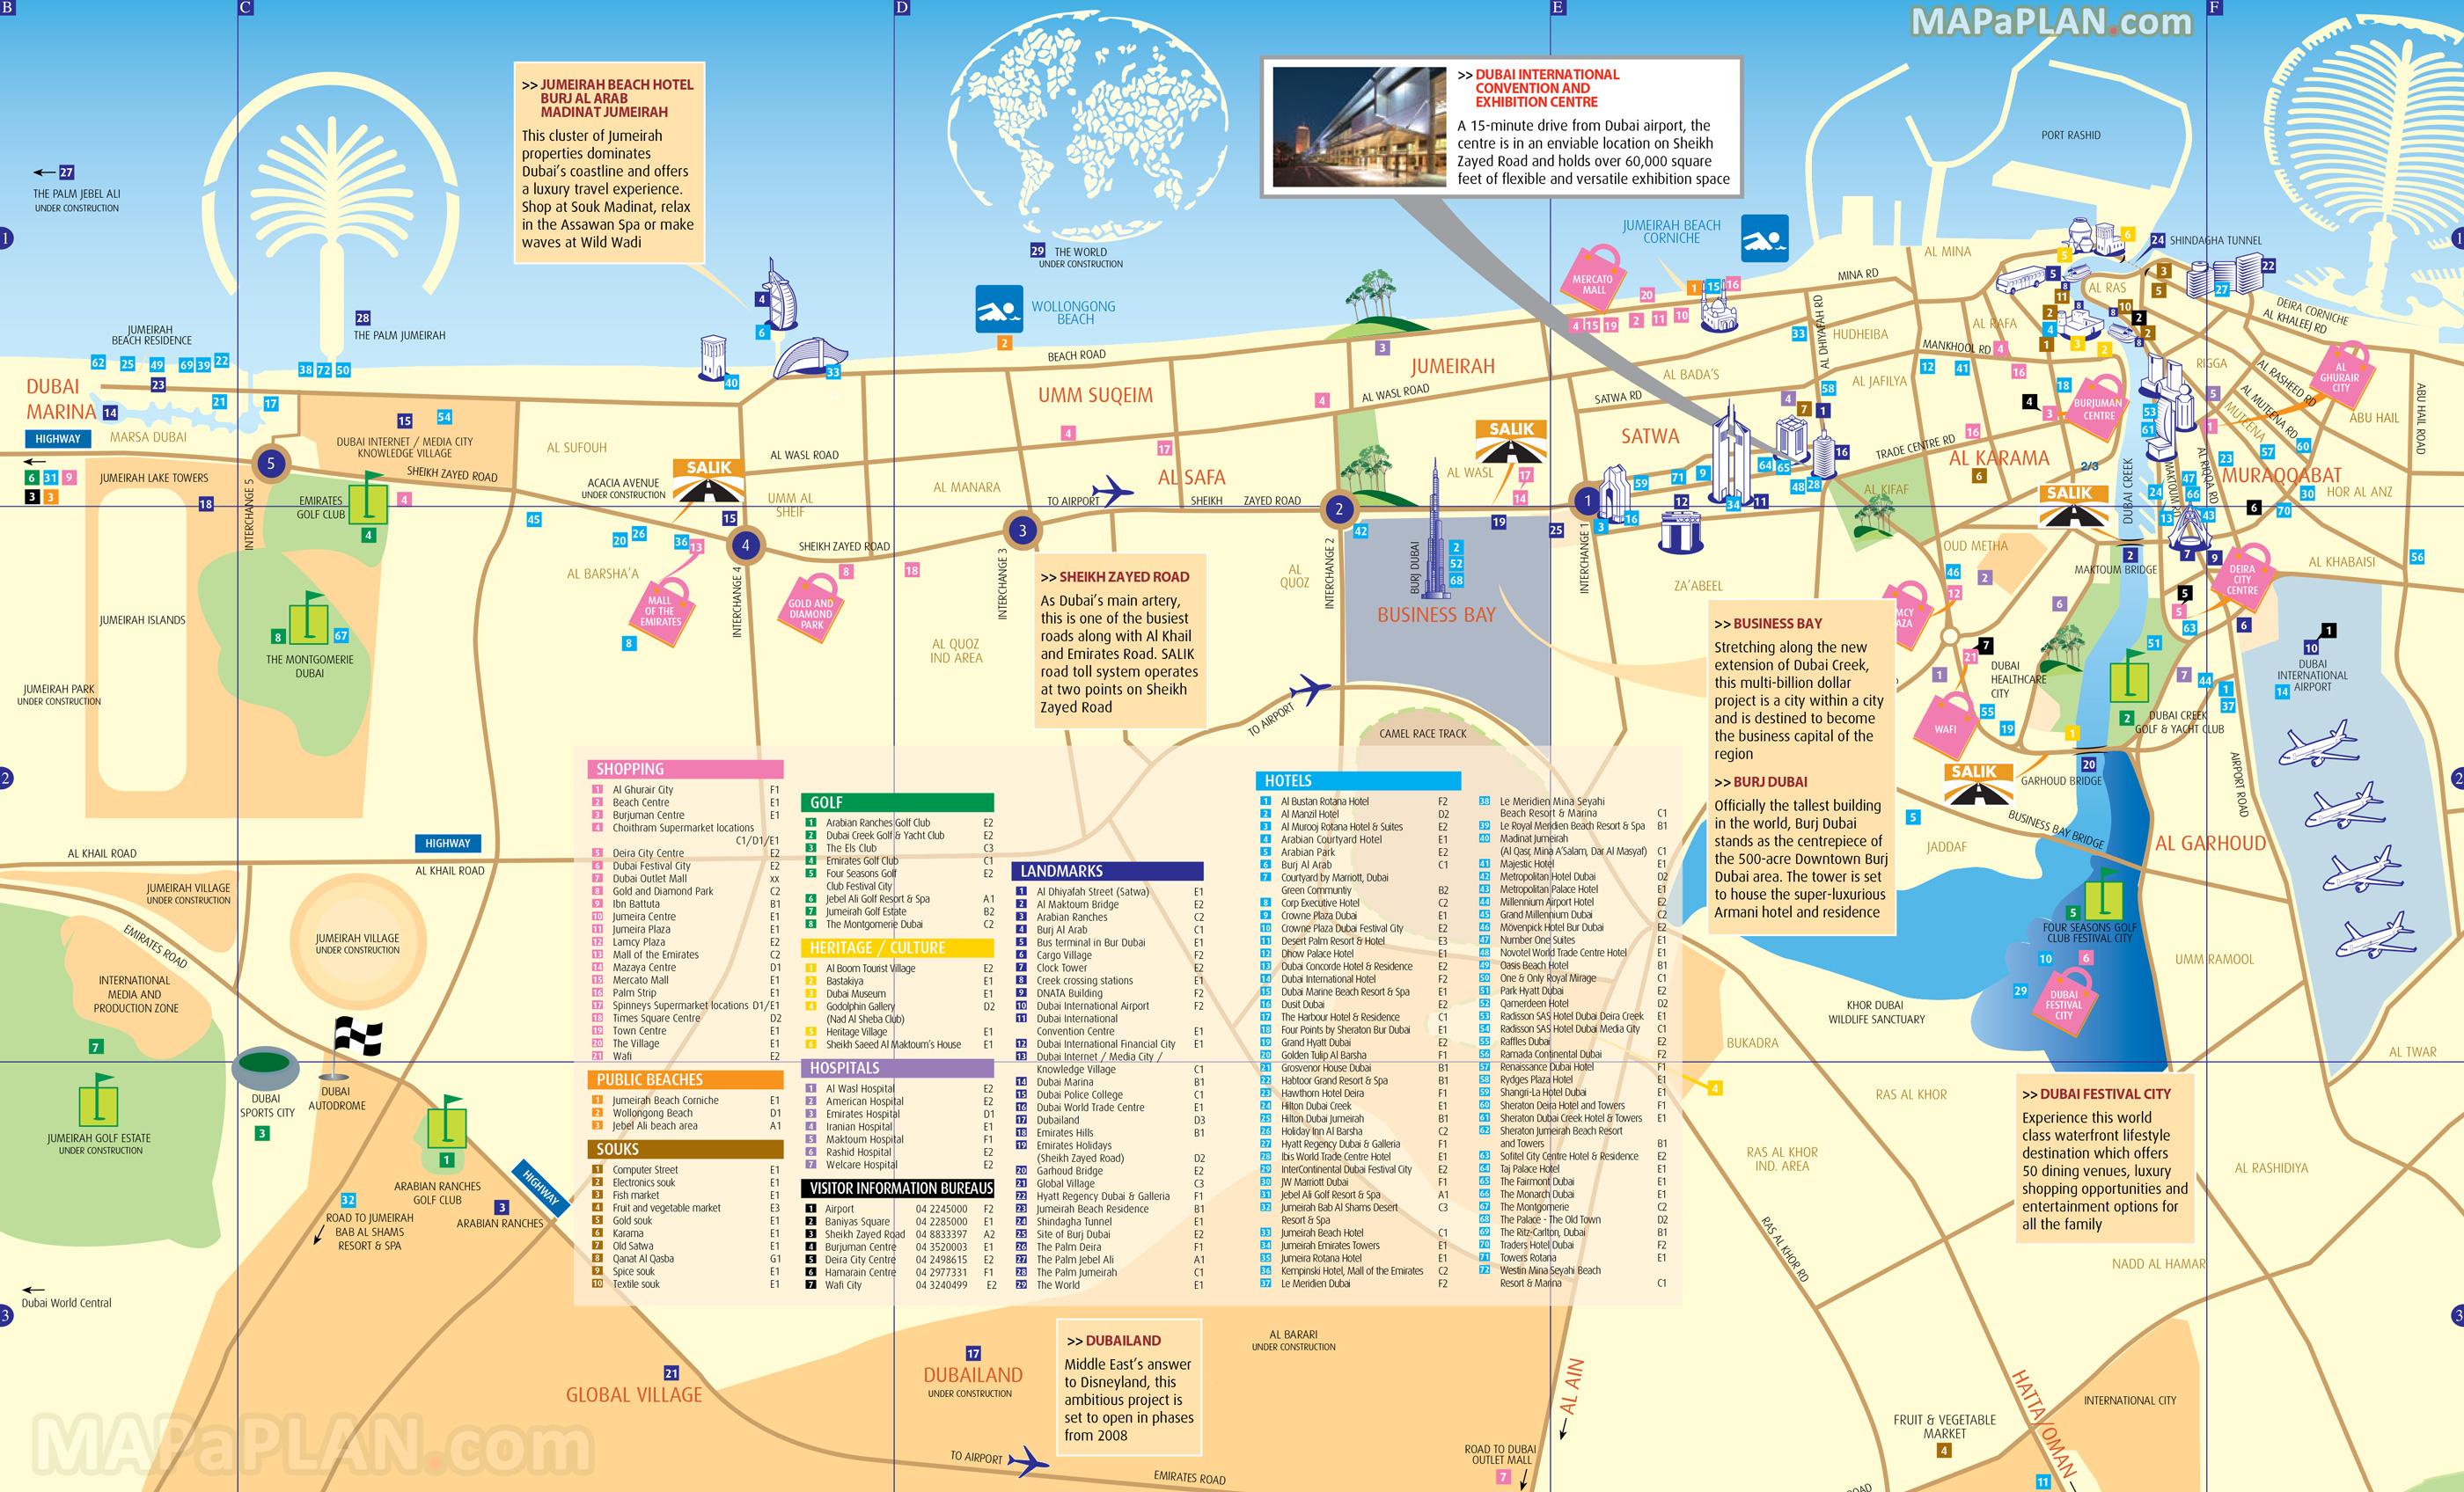 Dubai Maps - Top Tourist Attractions - Free, Printable City Street Map - Free Printable Travel Maps